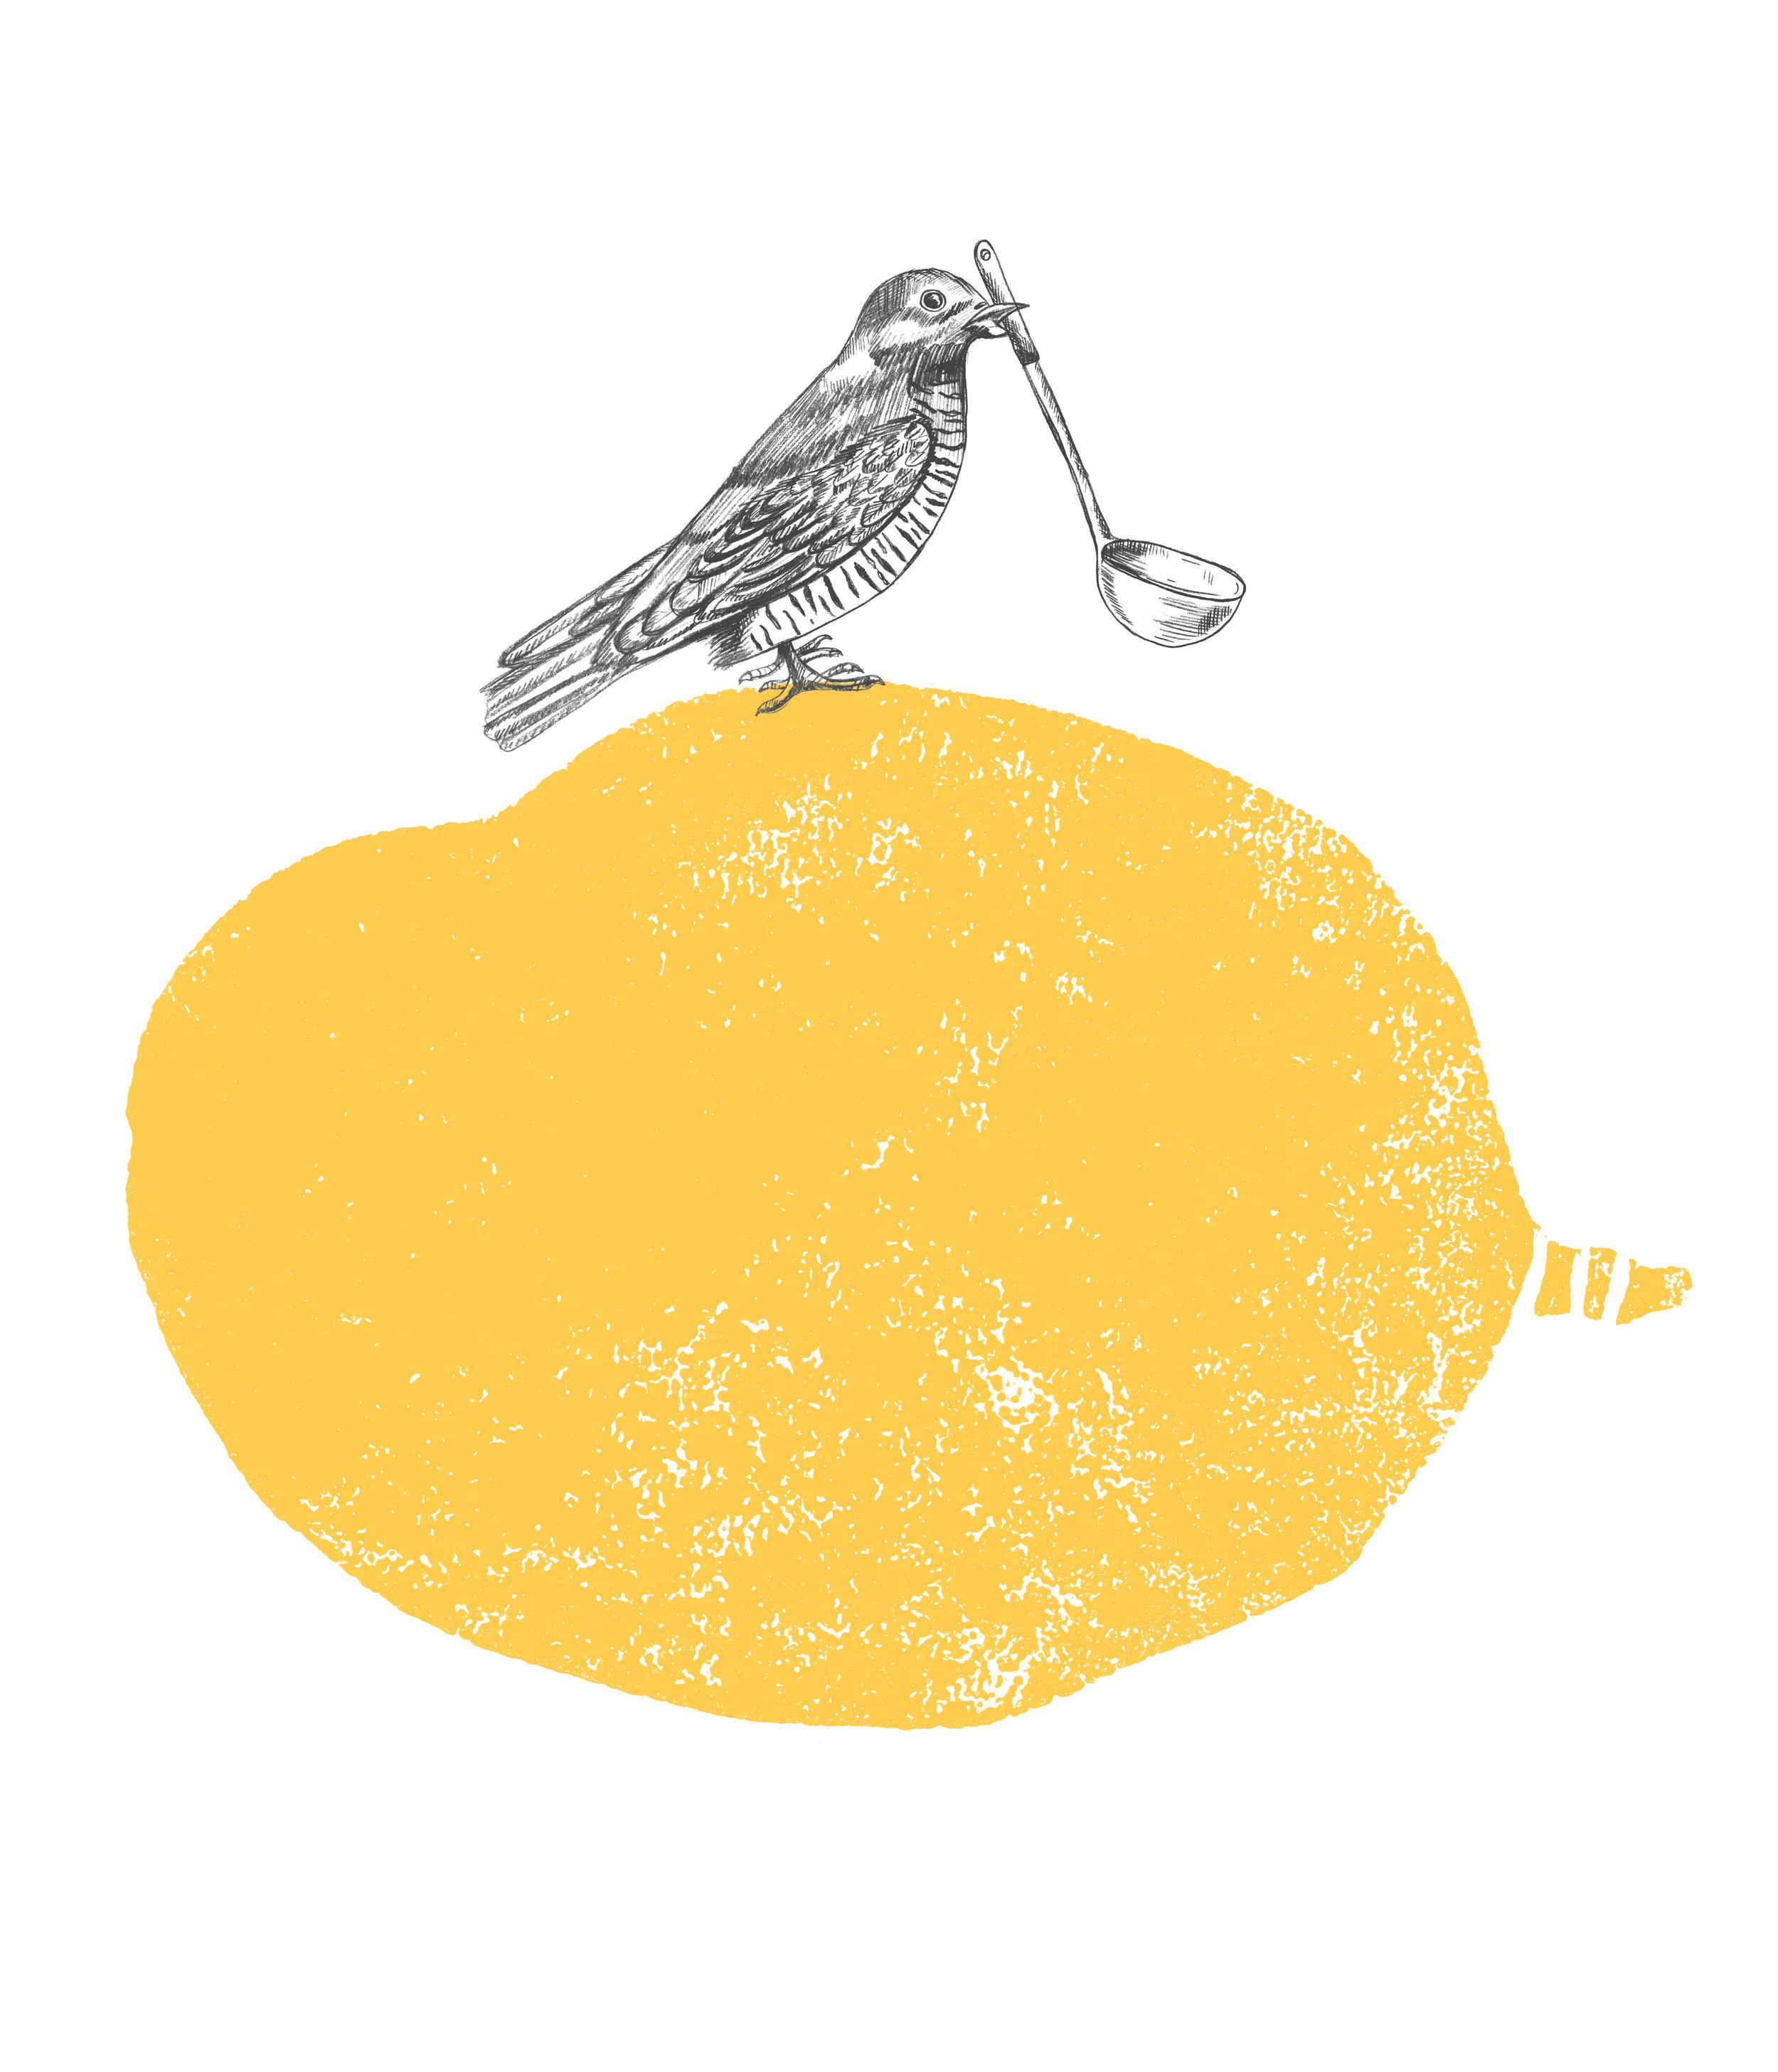 Airline Pot_Mango_Passion Fruit_Front Illustration.jpg